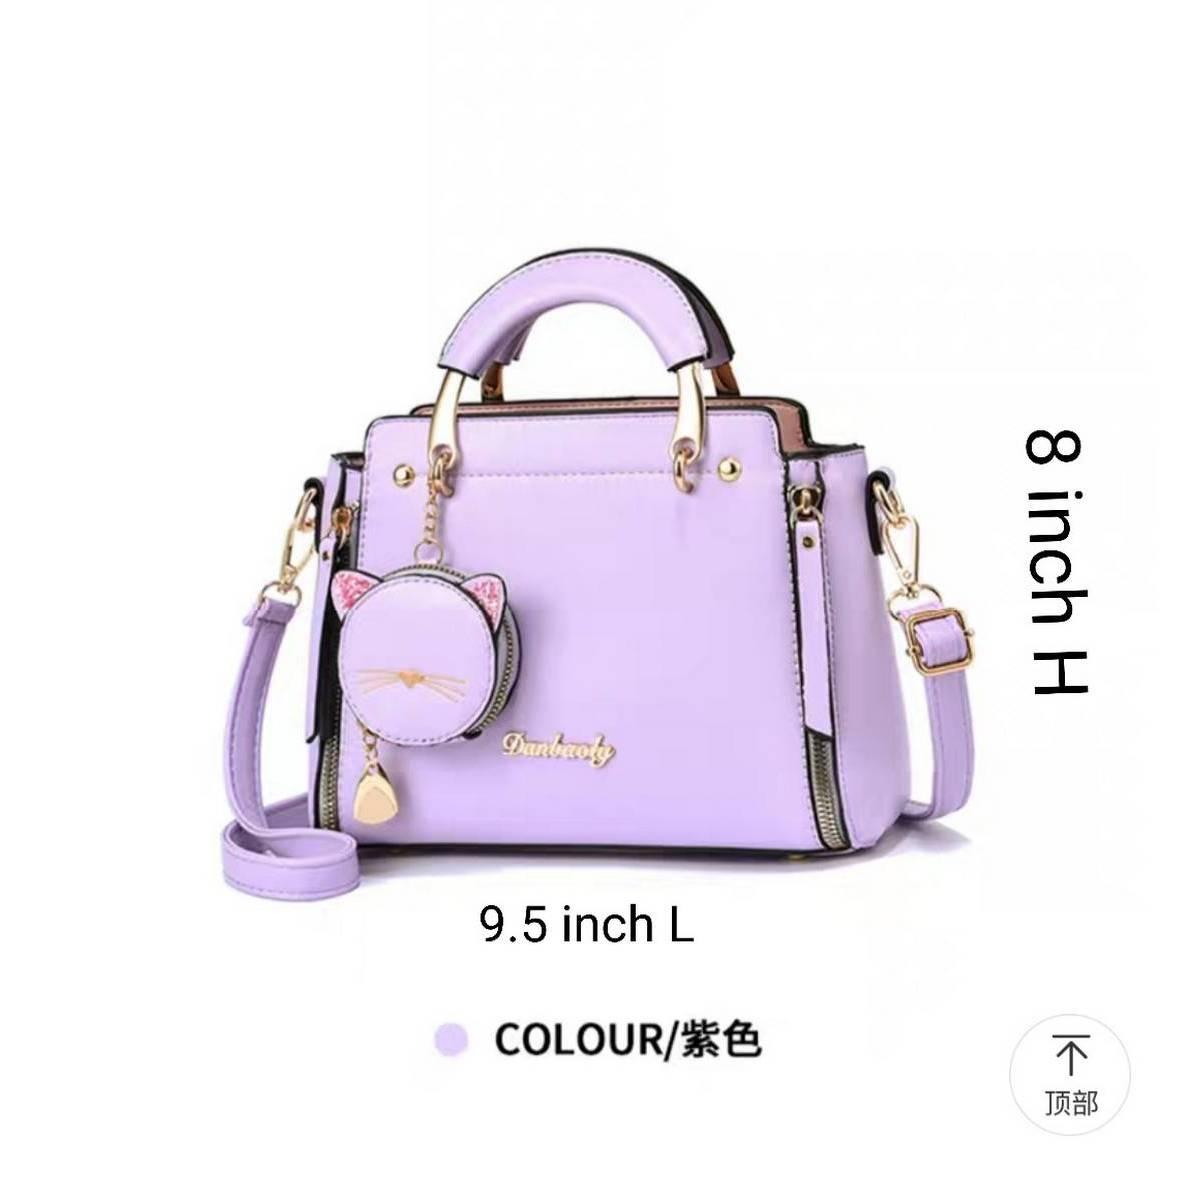 Ayesha Purse Luxury Woman's Handbag Fashion Pu Leather Shoulder Bags Famous Designer Brand Woman Handbags Square